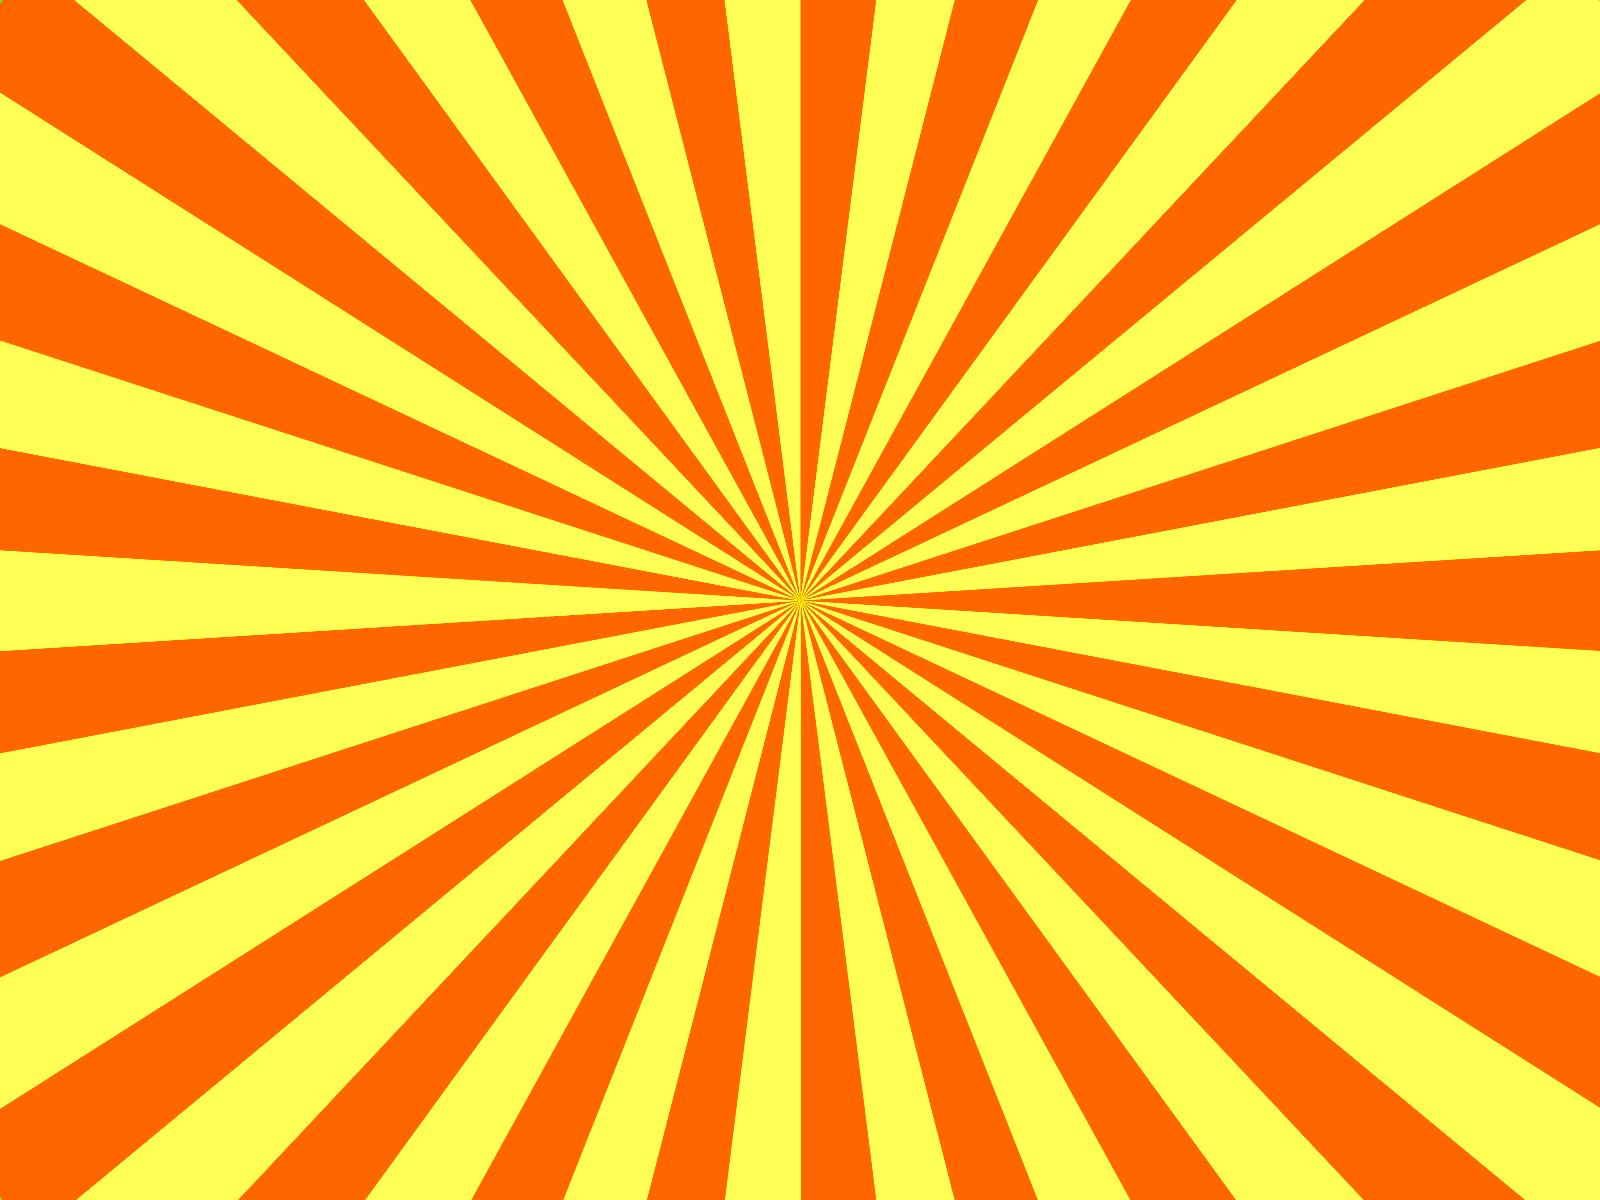 orange vector stripes by spooky-dream on DeviantArt